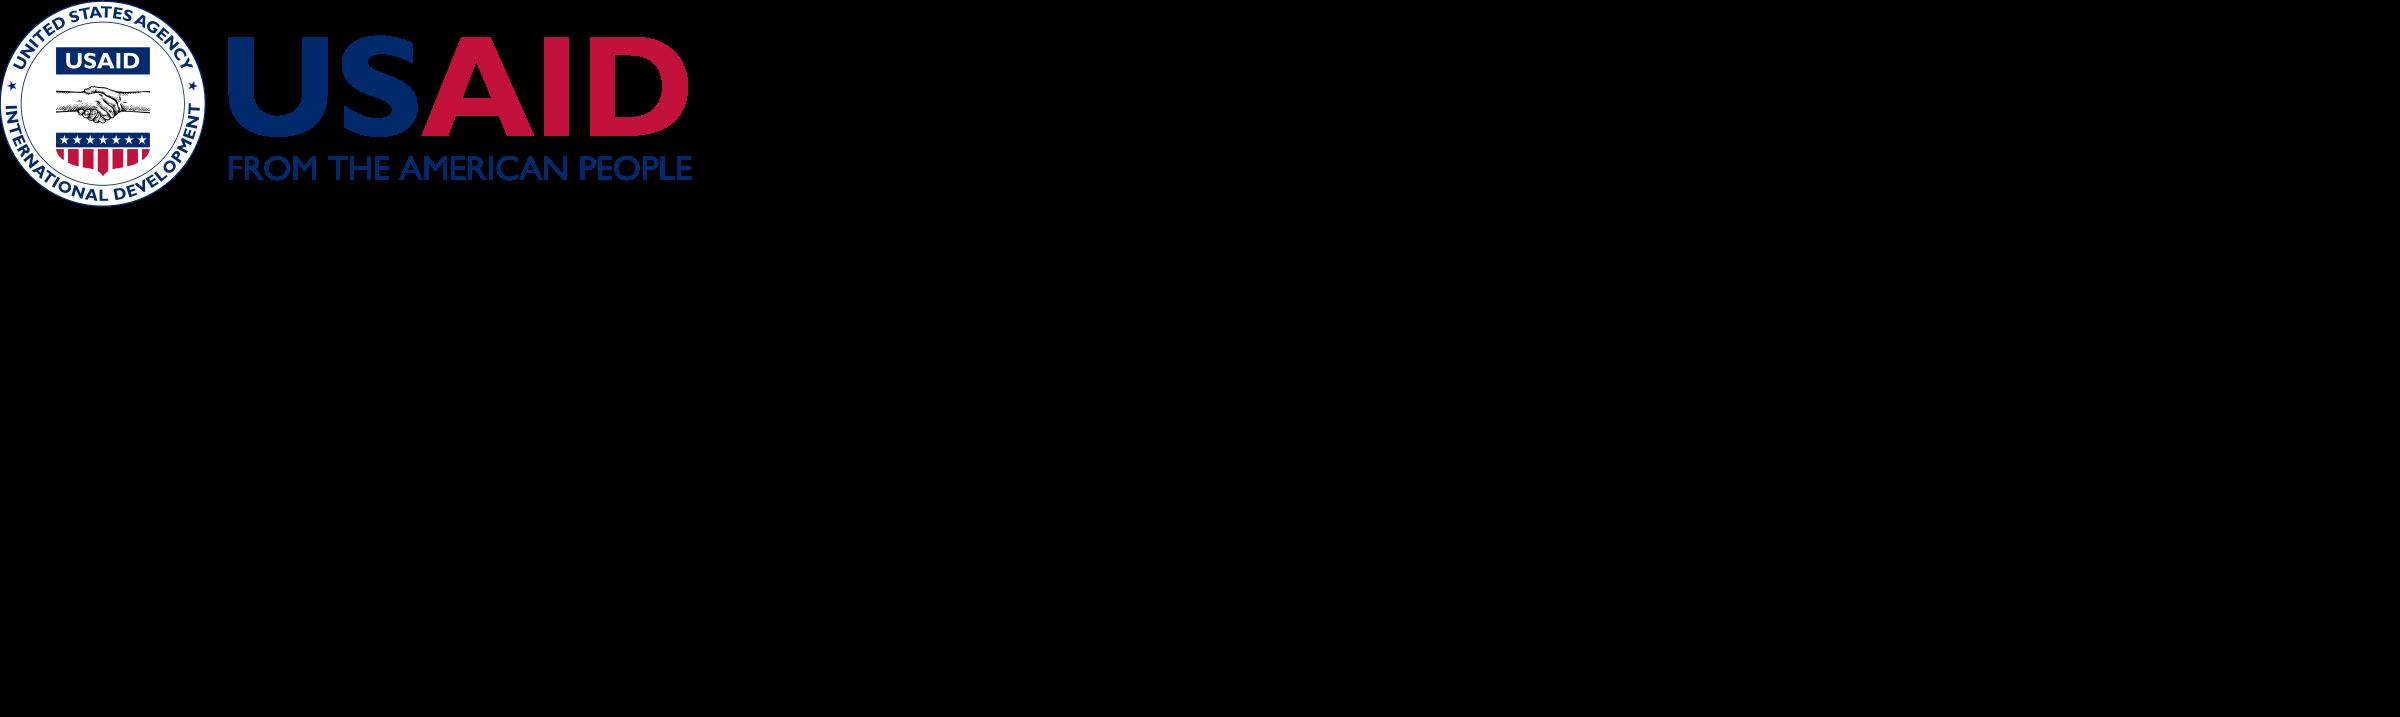 USAid Logo PNG Transparent & SVG Vector.